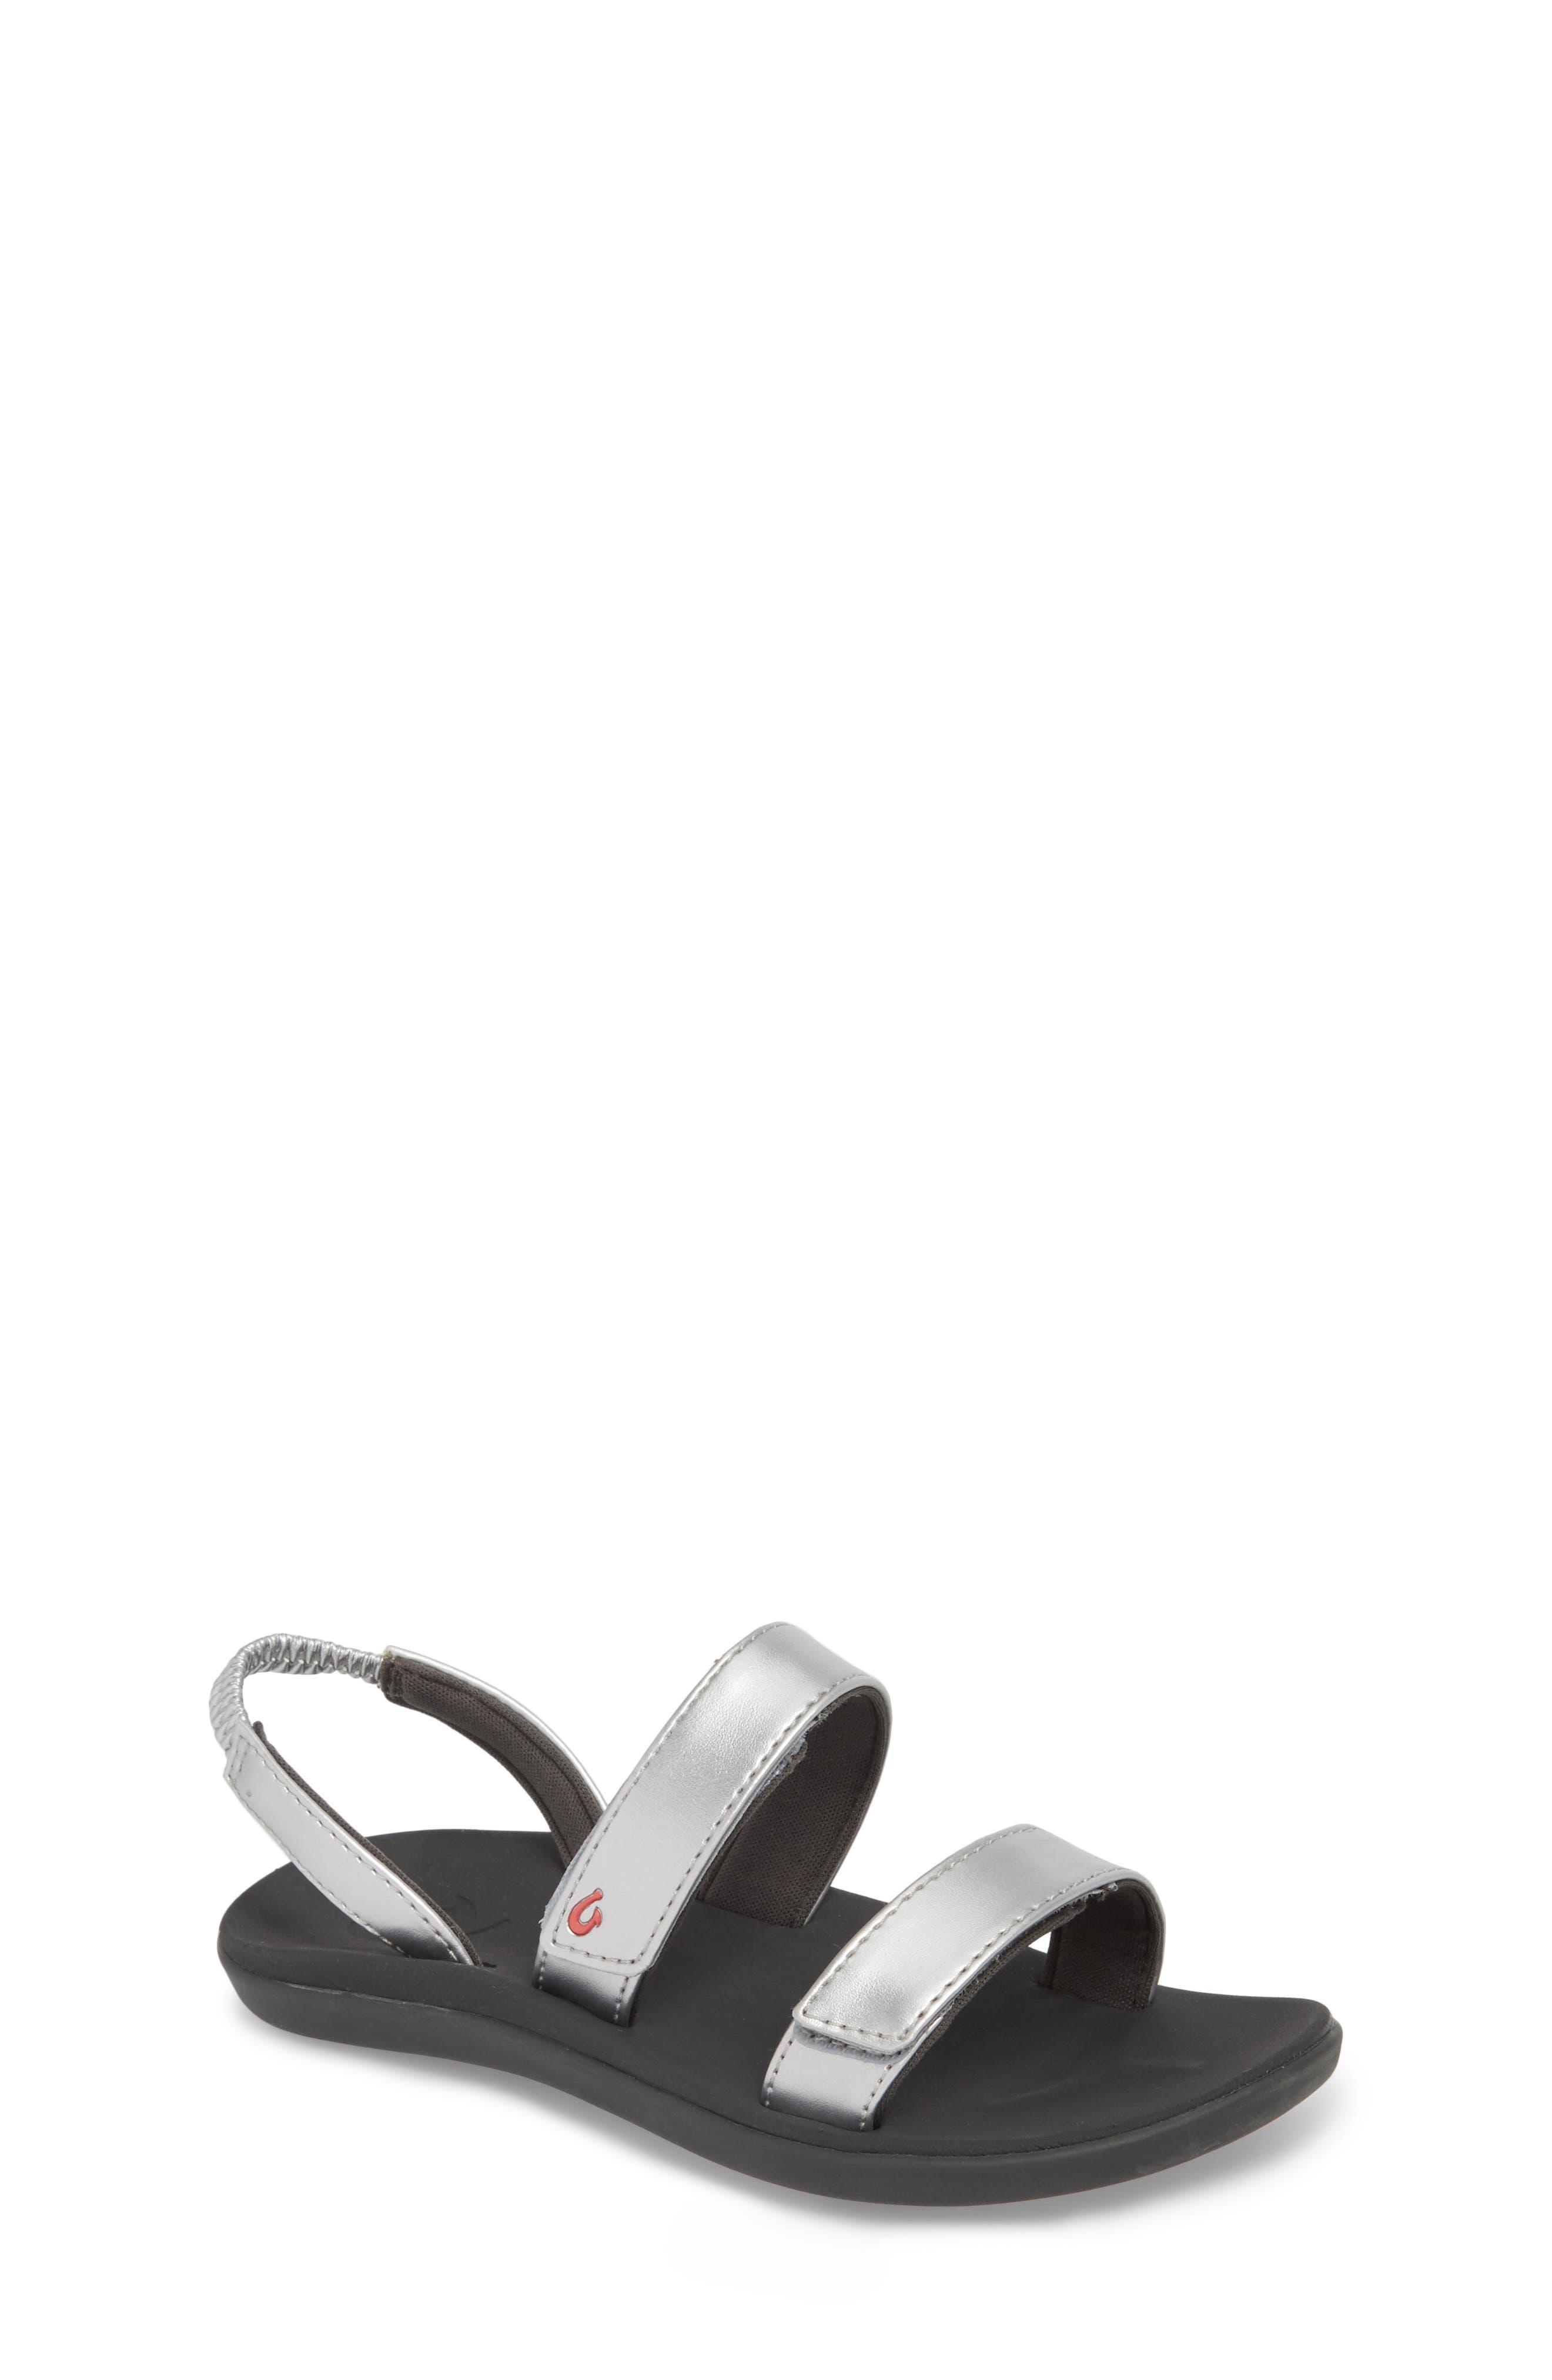 OLUKAI Kipuka Sandal, Main, color, SILVER/ DARK SHADOW